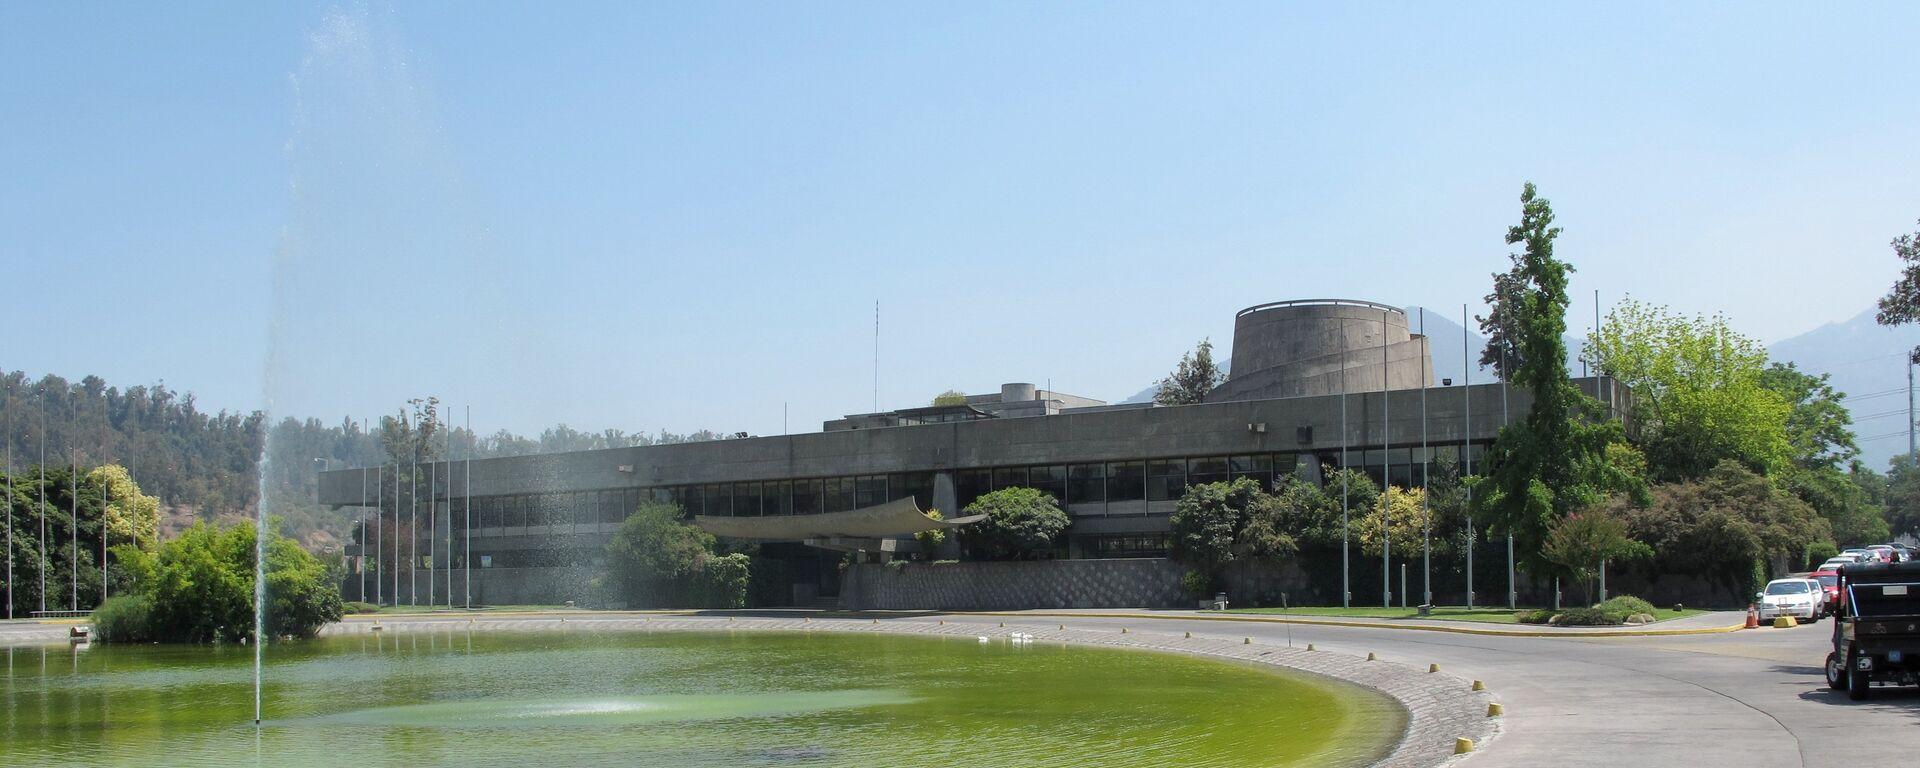 Sede de la Cepal en Santiago - Sputnik Mundo, 1920, 22.04.2021